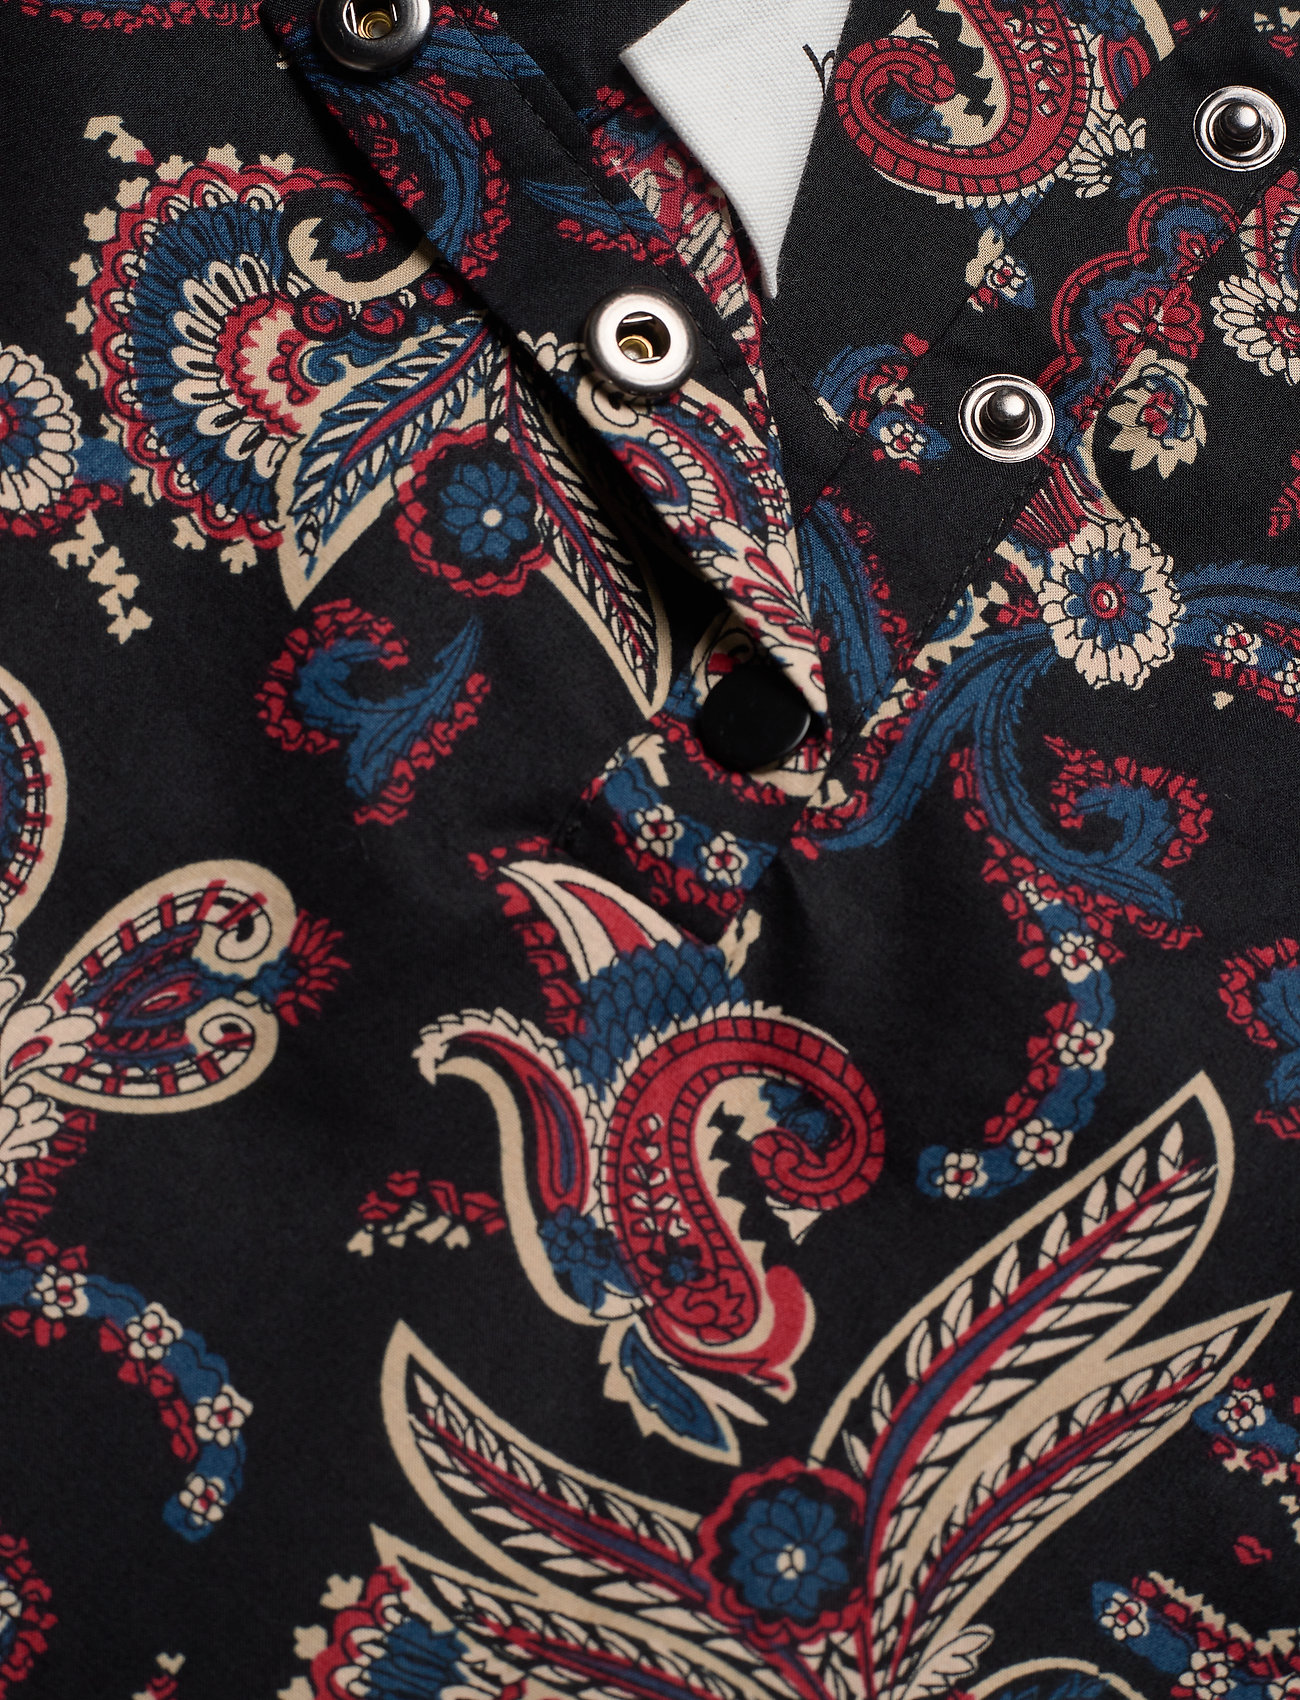 Ba&sh Top Rym - Blusar & Skjortor Noir